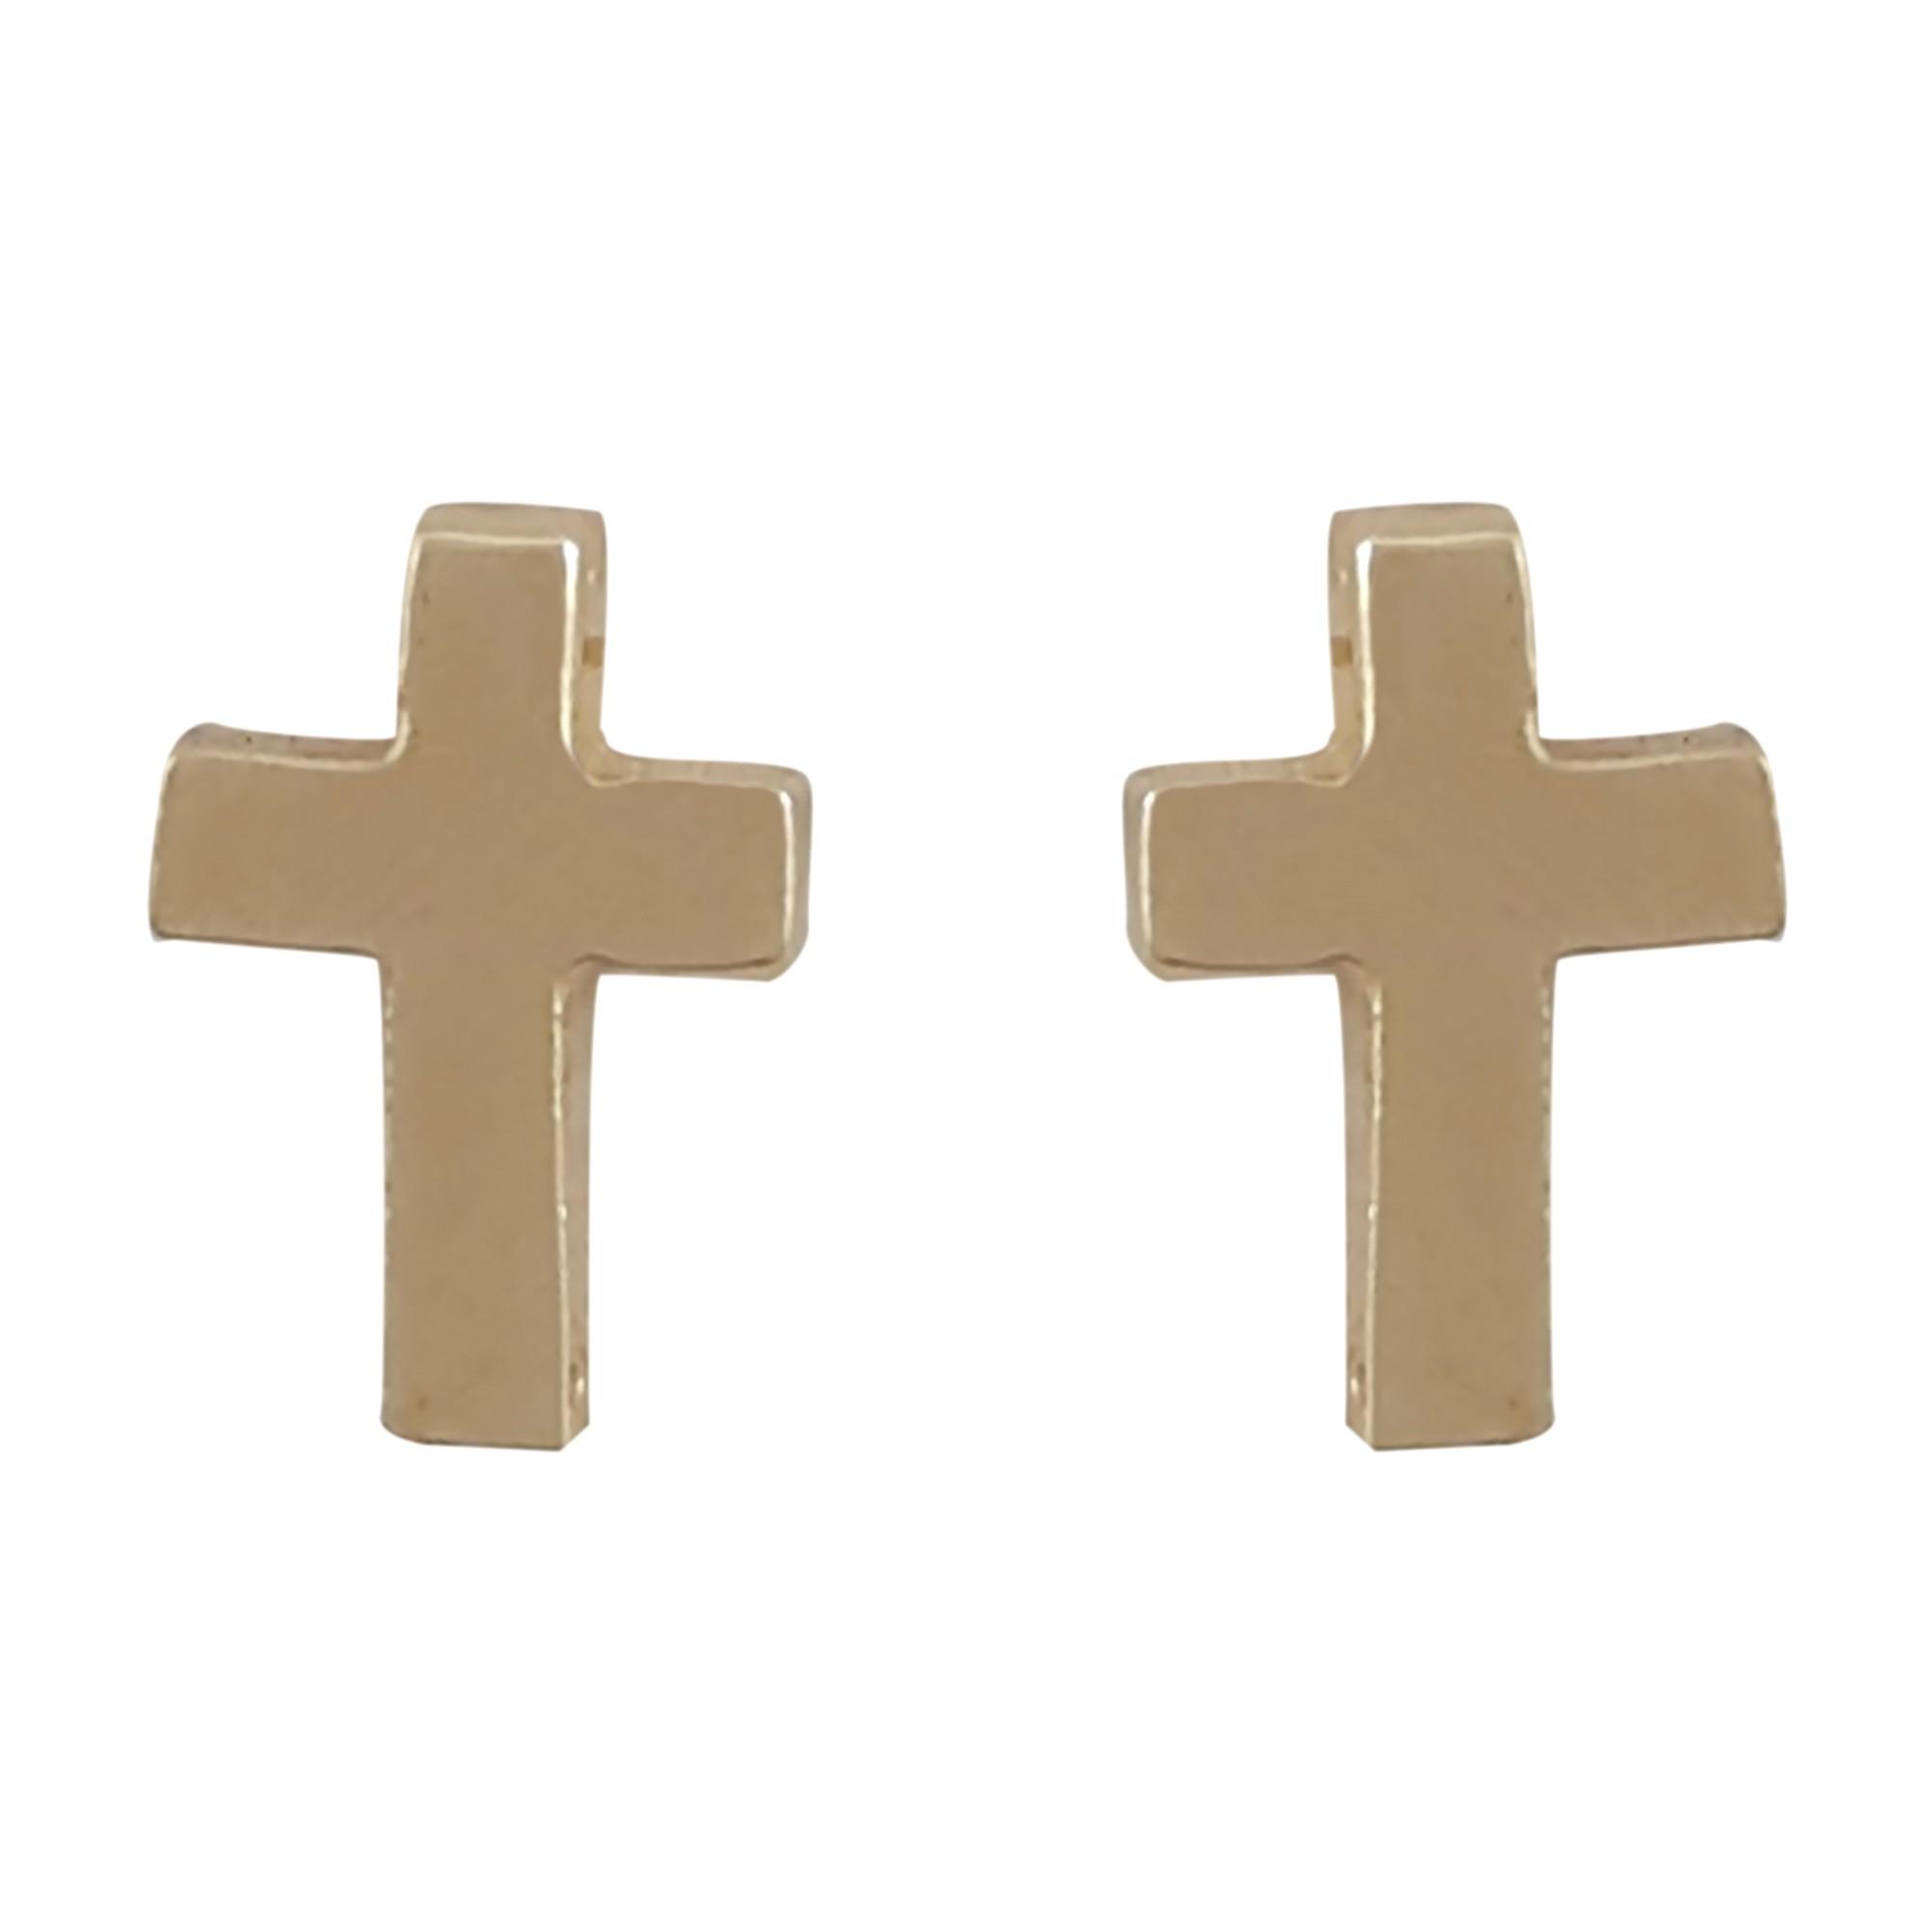 Brinco cruz pequena banhado a ouro 18k e Ródio branco